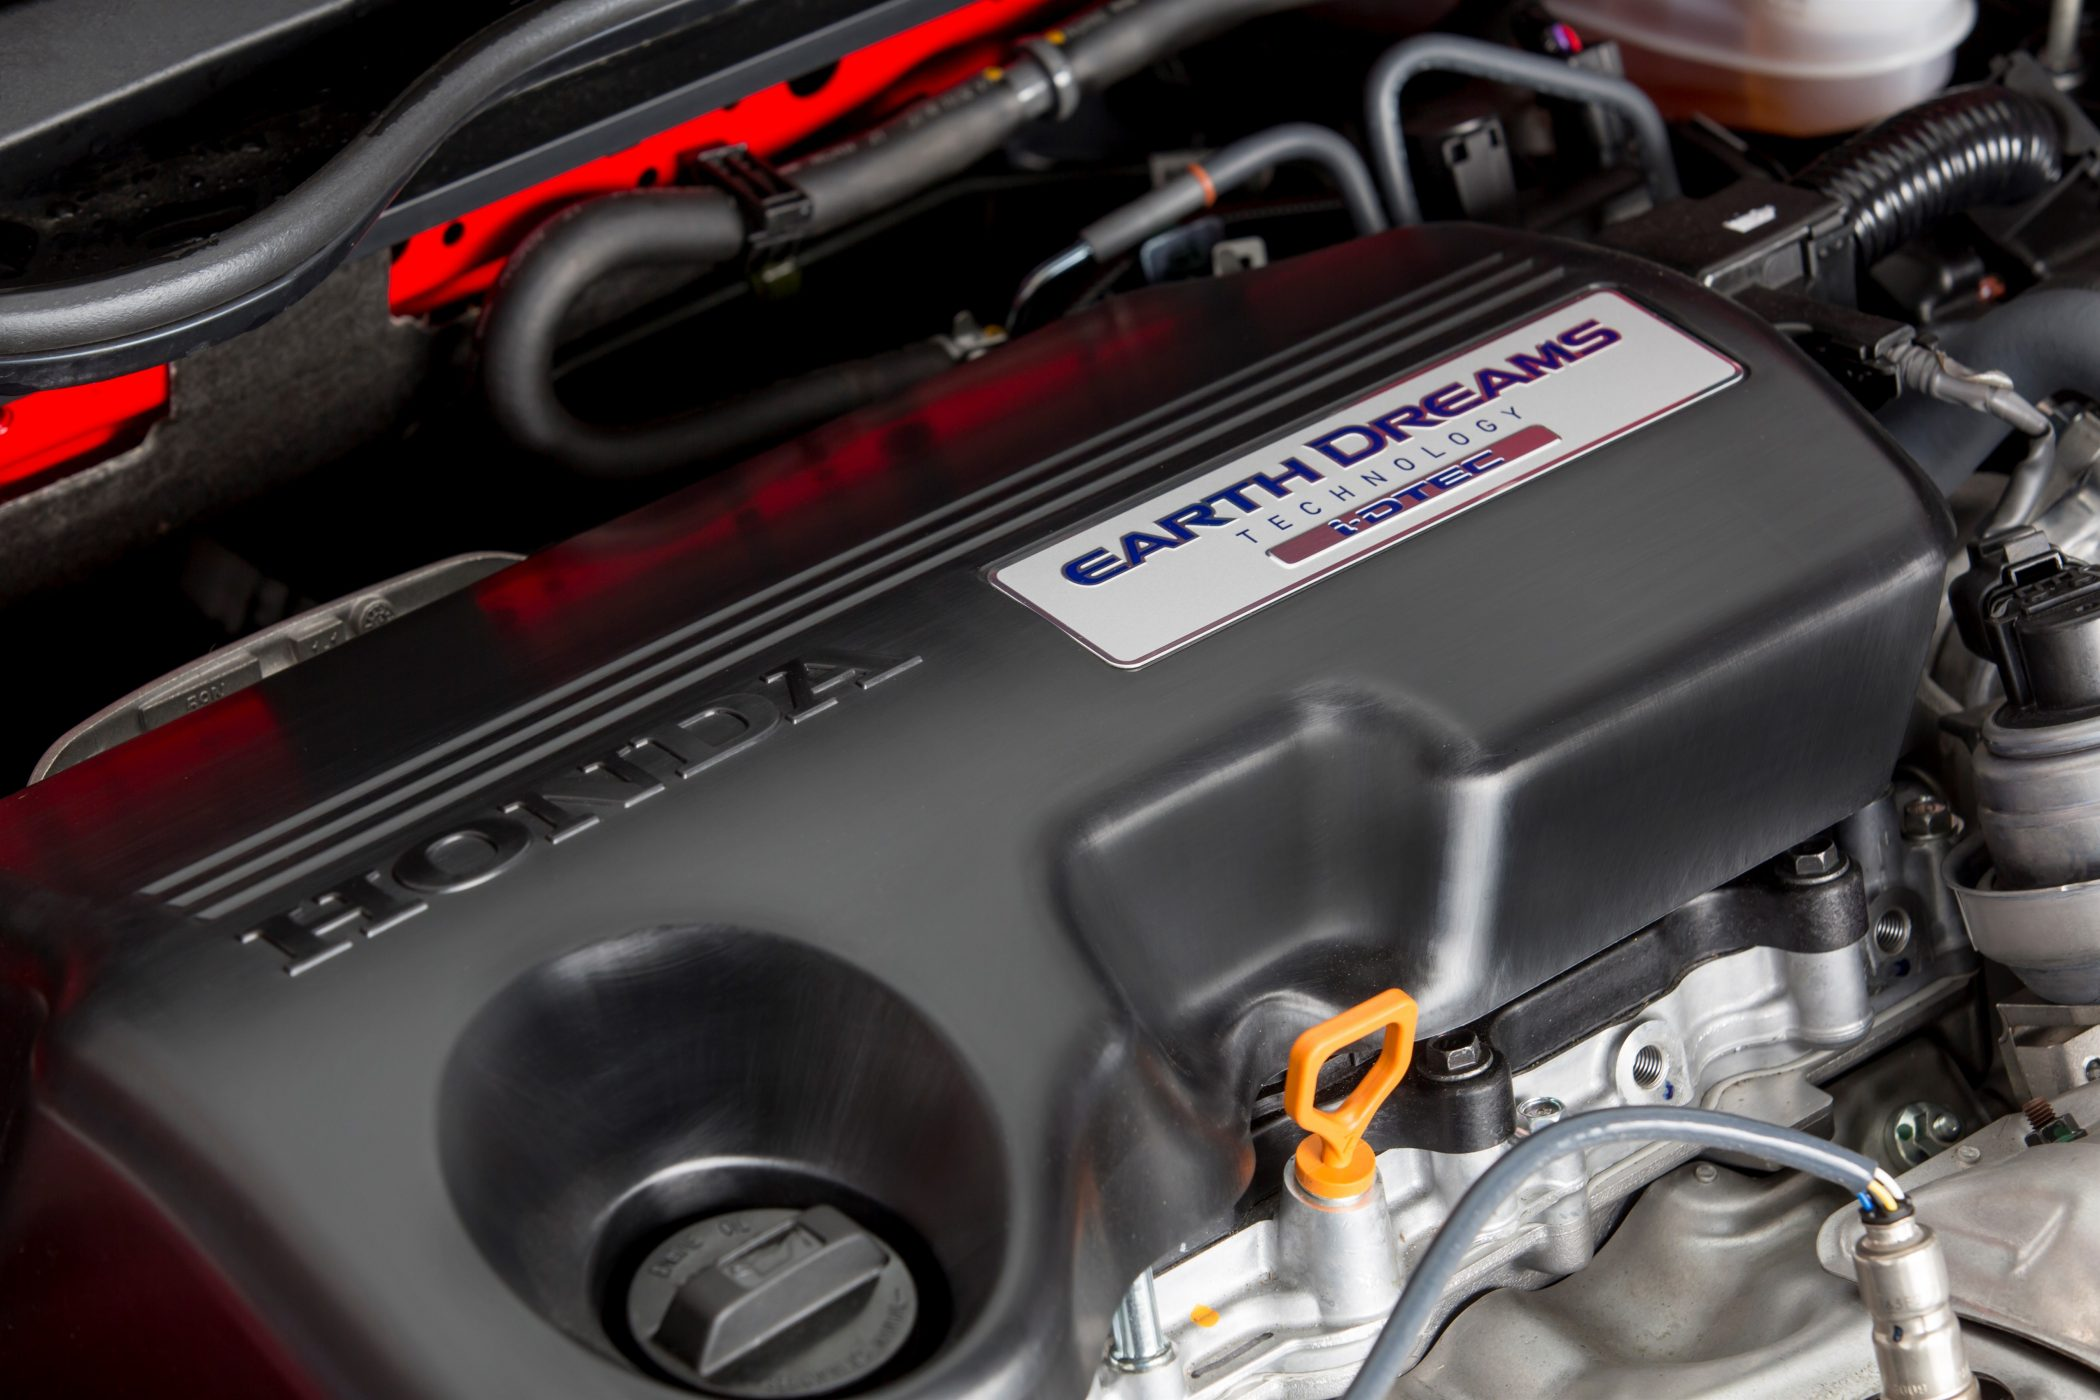 Honda Civic i-DTEC motor